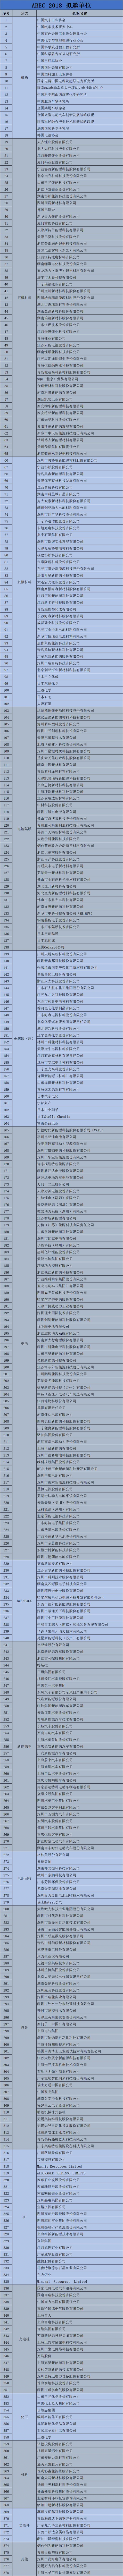 ABEC 2018拟邀单位